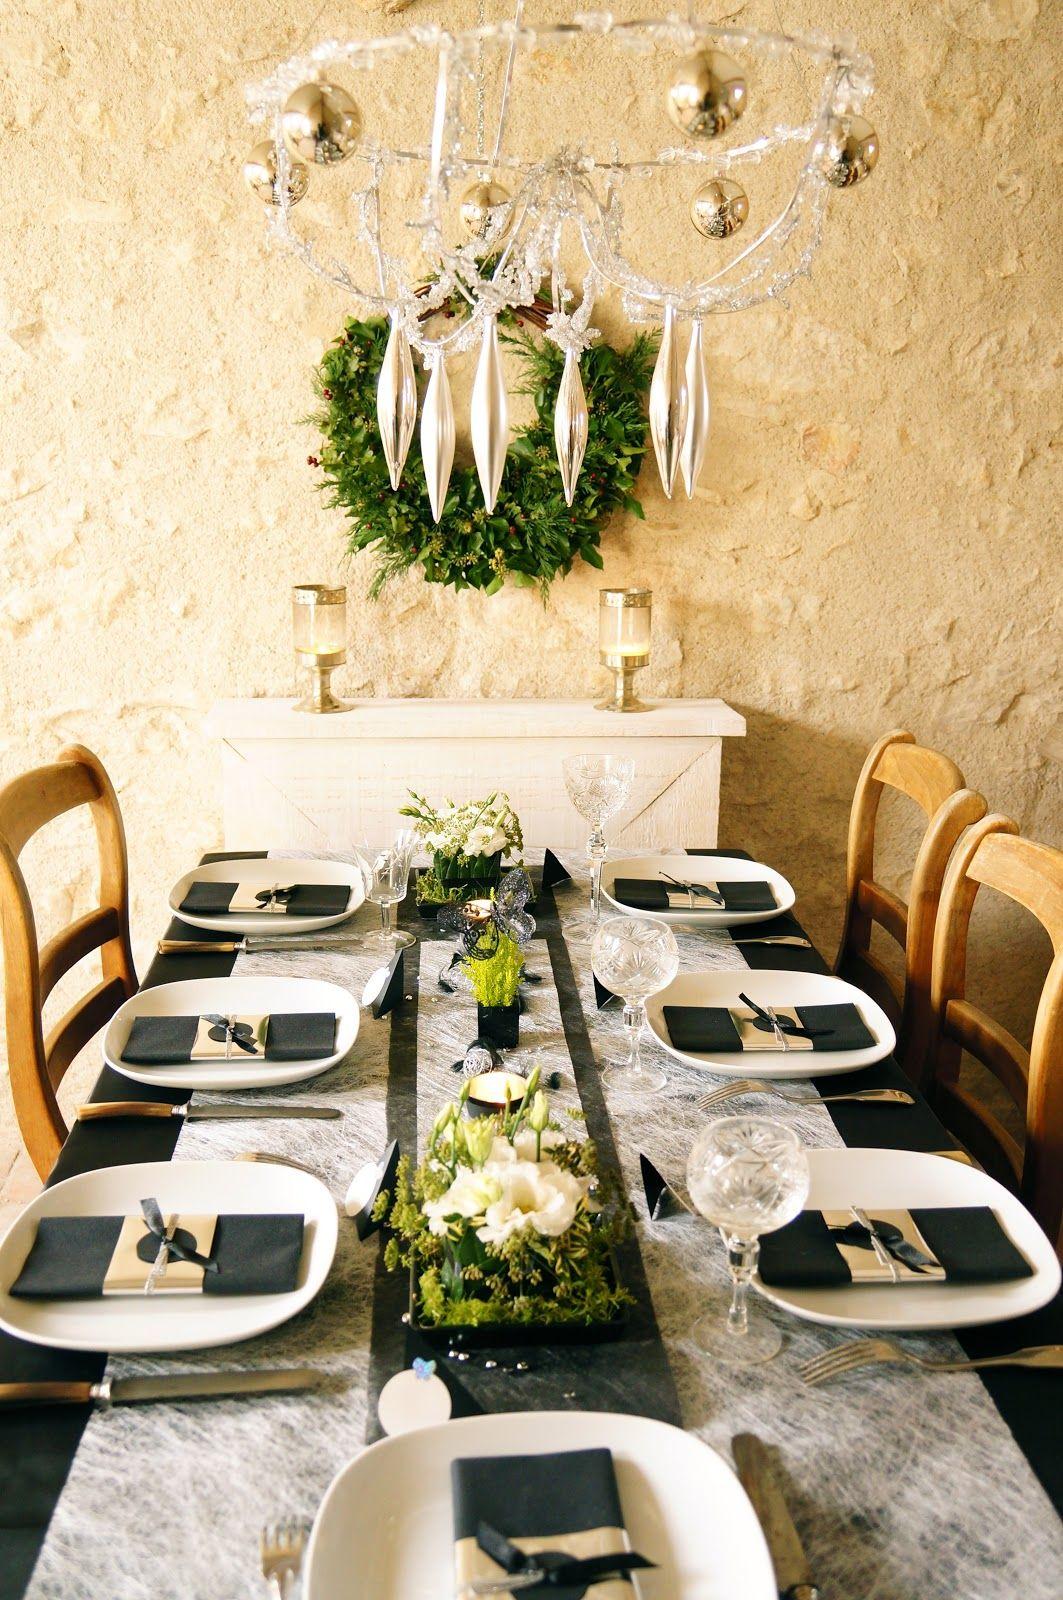 table decorations noel ma boutique deco table decoration de table un noel so chic